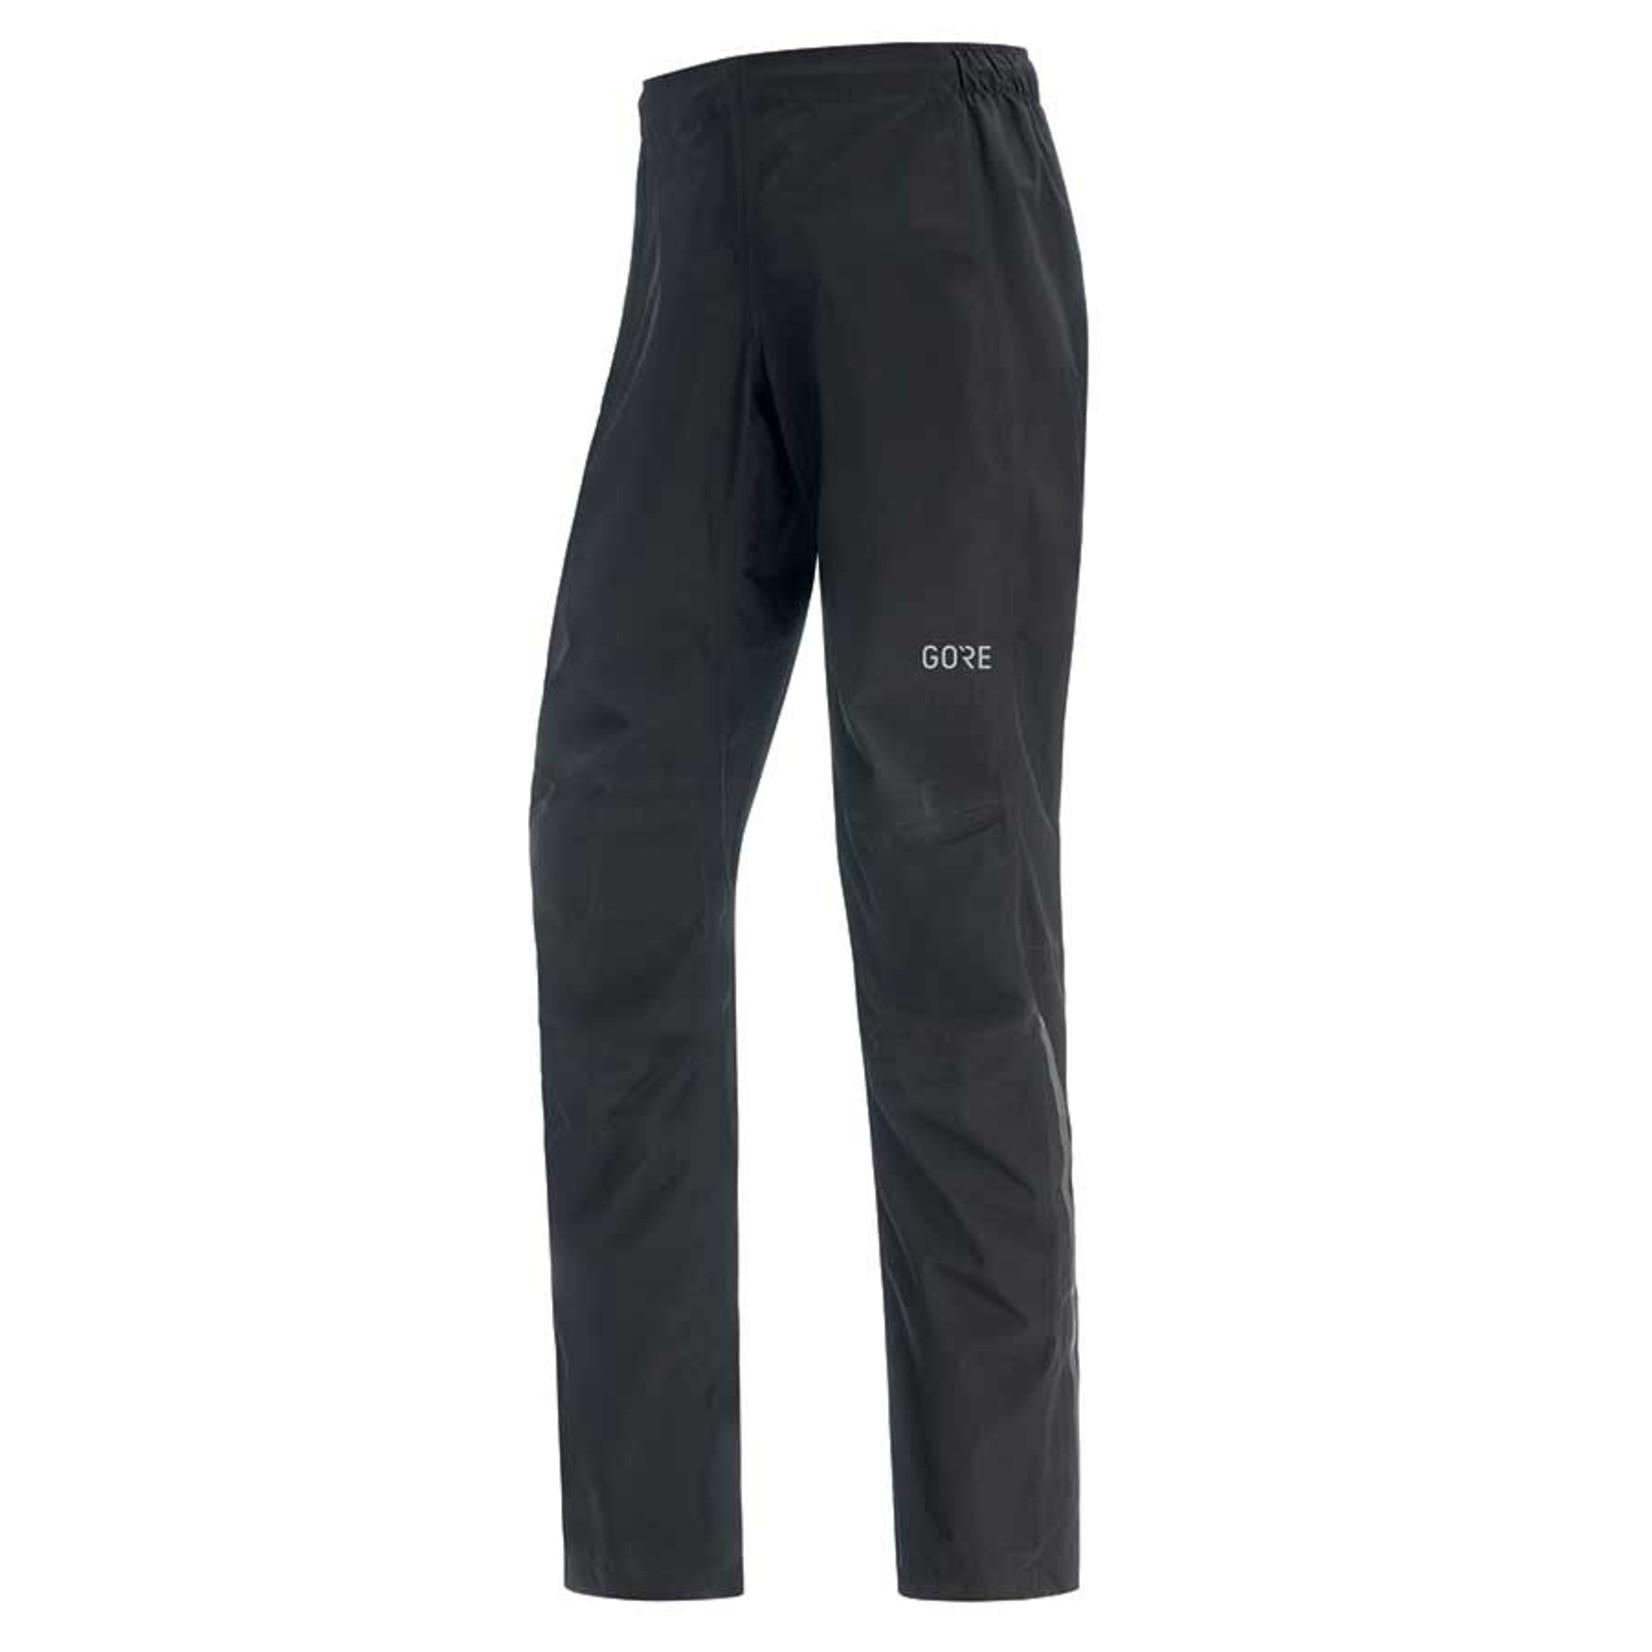 Gore Wear Gore Wear Men's C3 Paclite Rain Pants